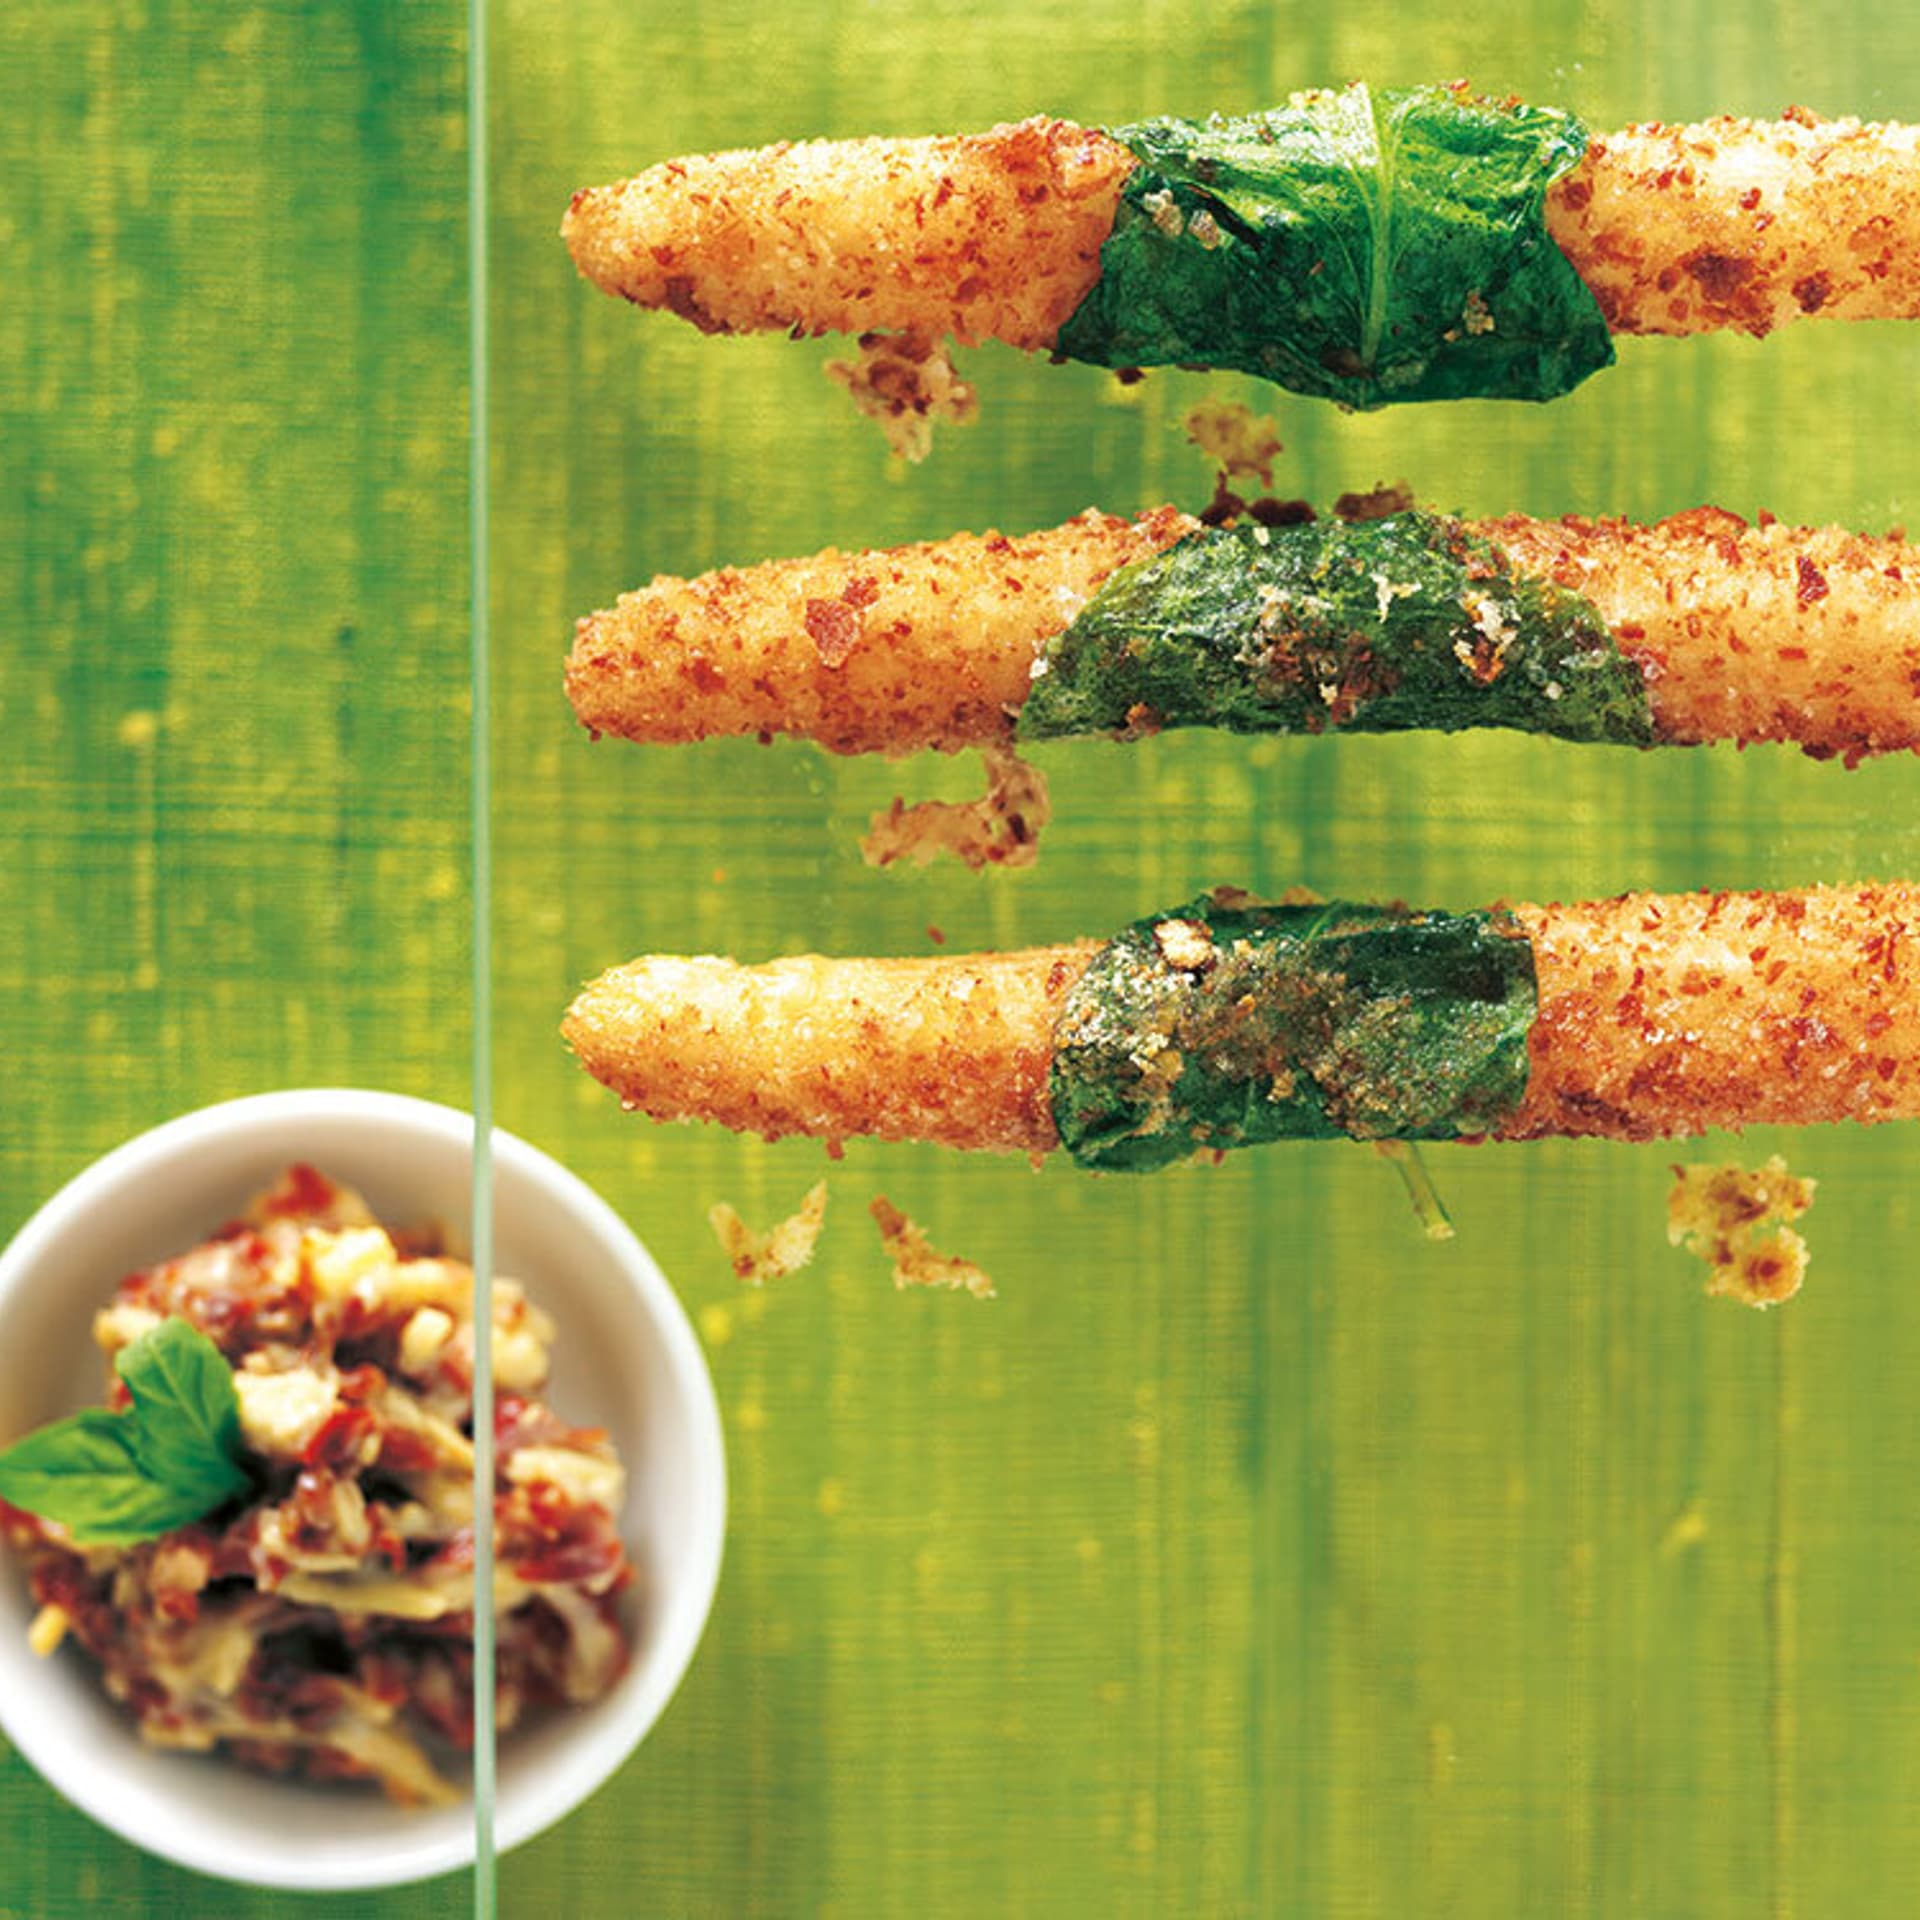 Spargel in Brezelbrösel mit Käse-Dip